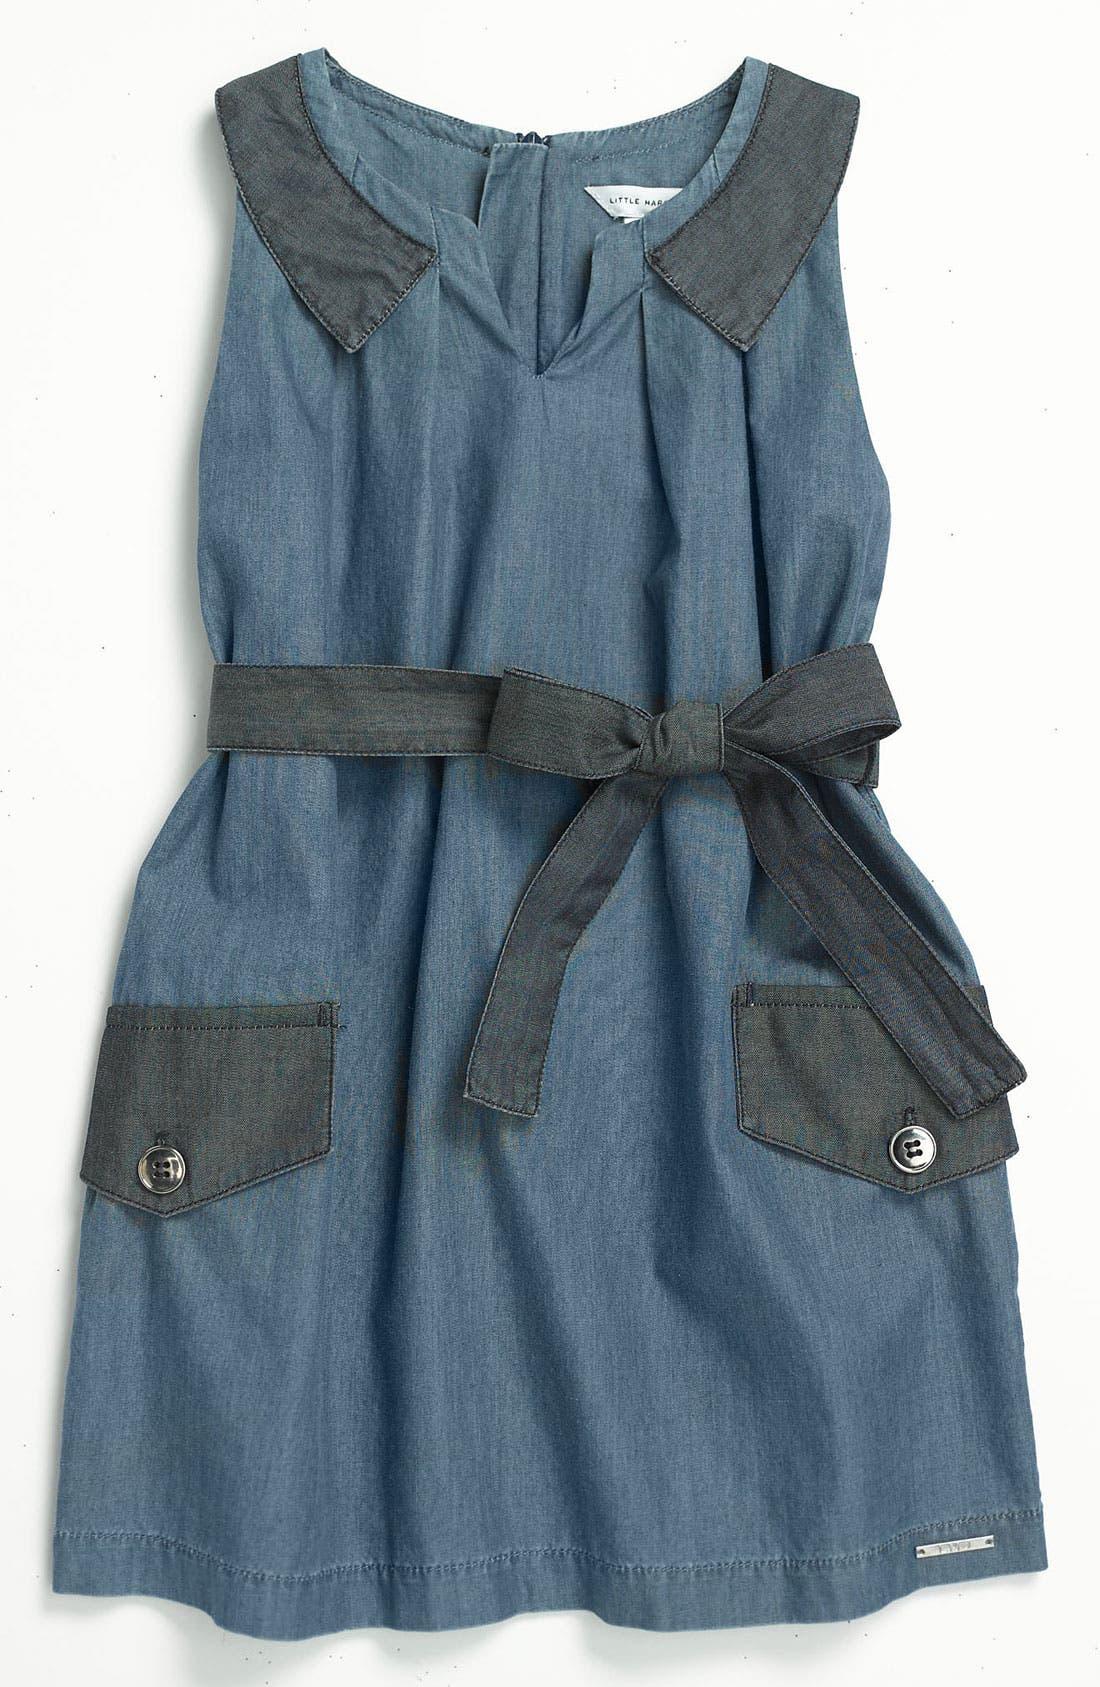 Alternate Image 1 Selected - LITTLE MARC JACOBS Sleeveless Chambray Dress (Little Girls & Big Girls)